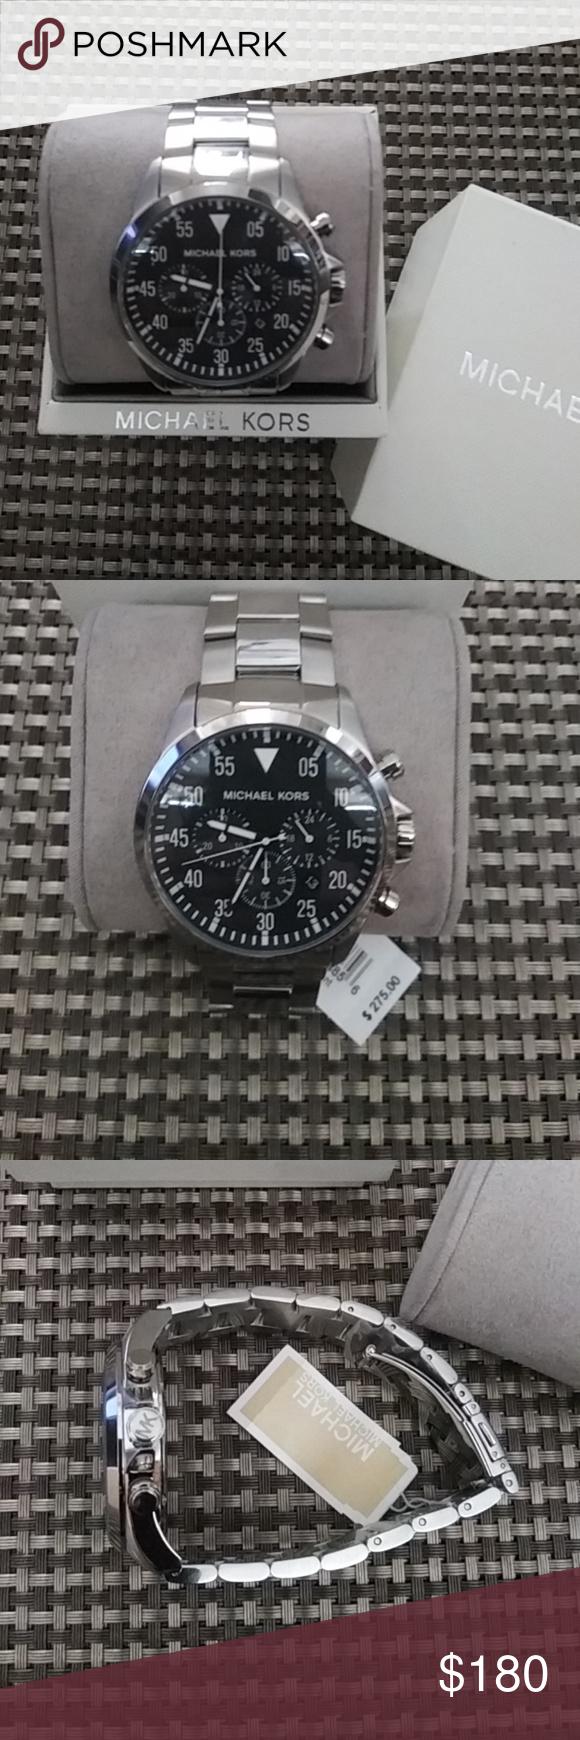 1e3617916bc1 Michael kors men watch New MK 8413 Michael Kors Accessories Watches ...